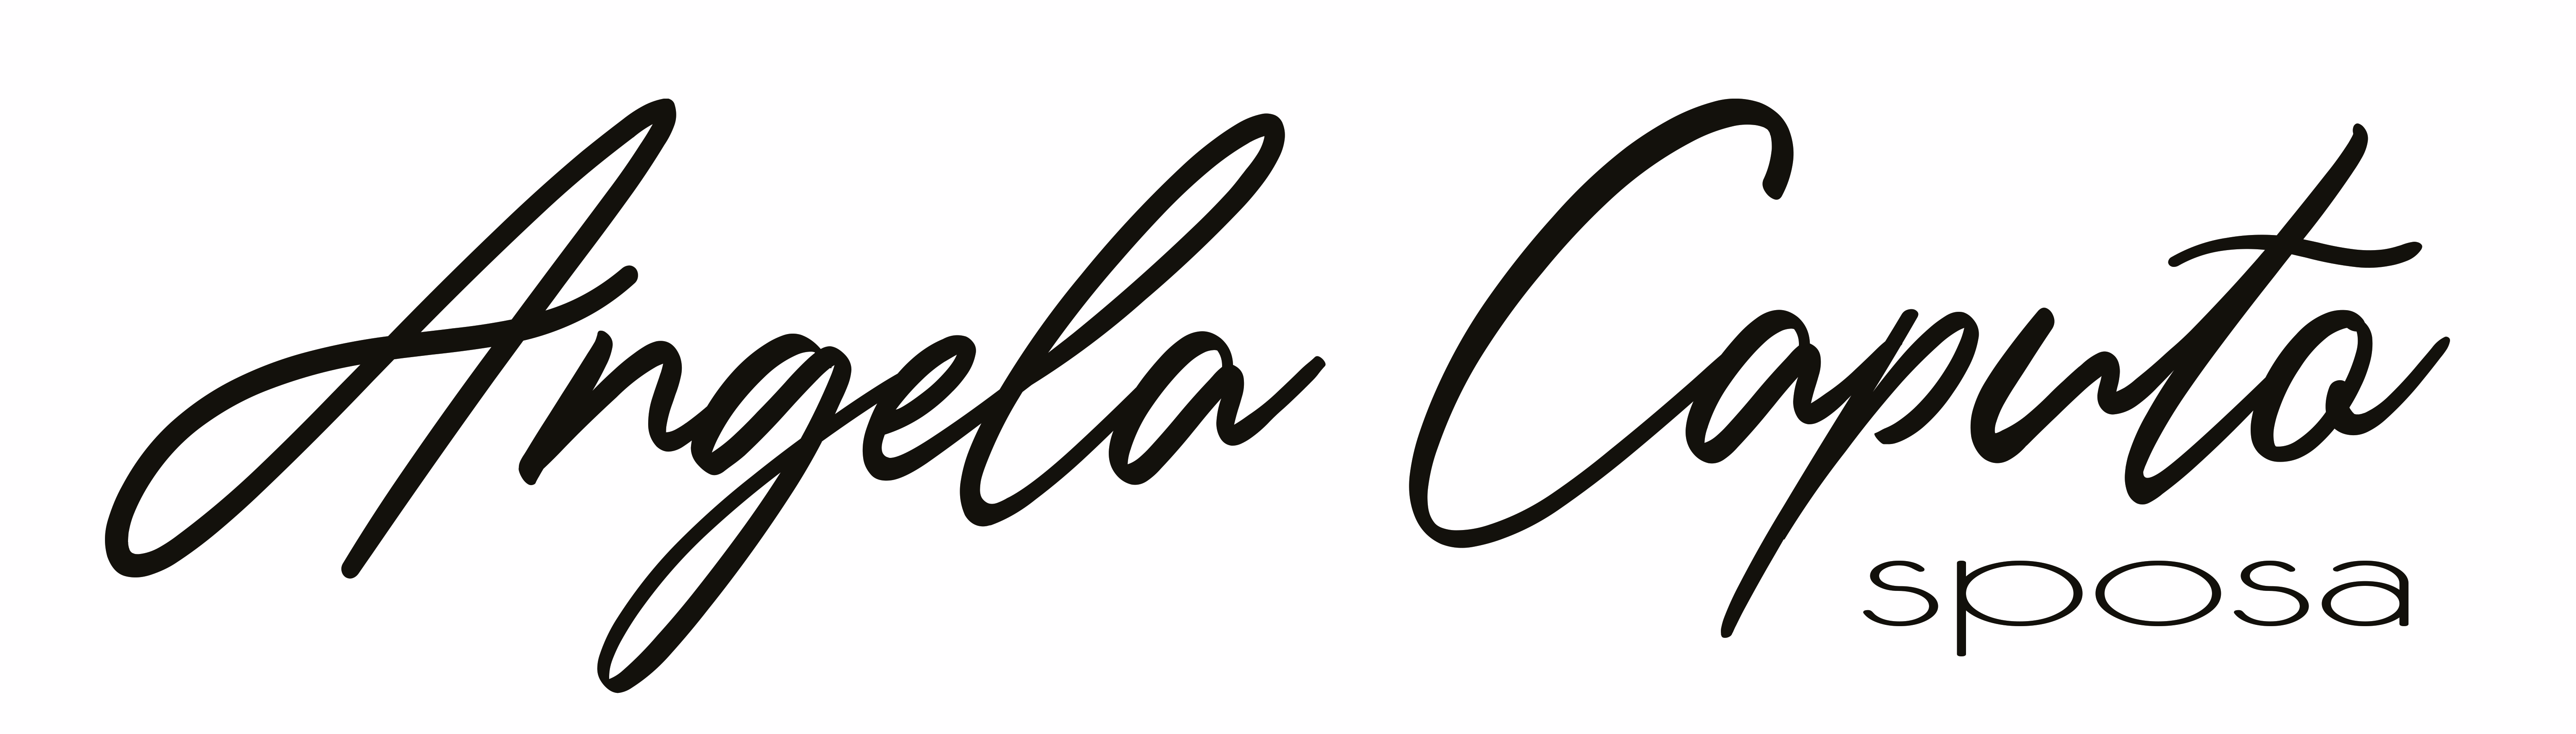 Angela Caputo Sposa